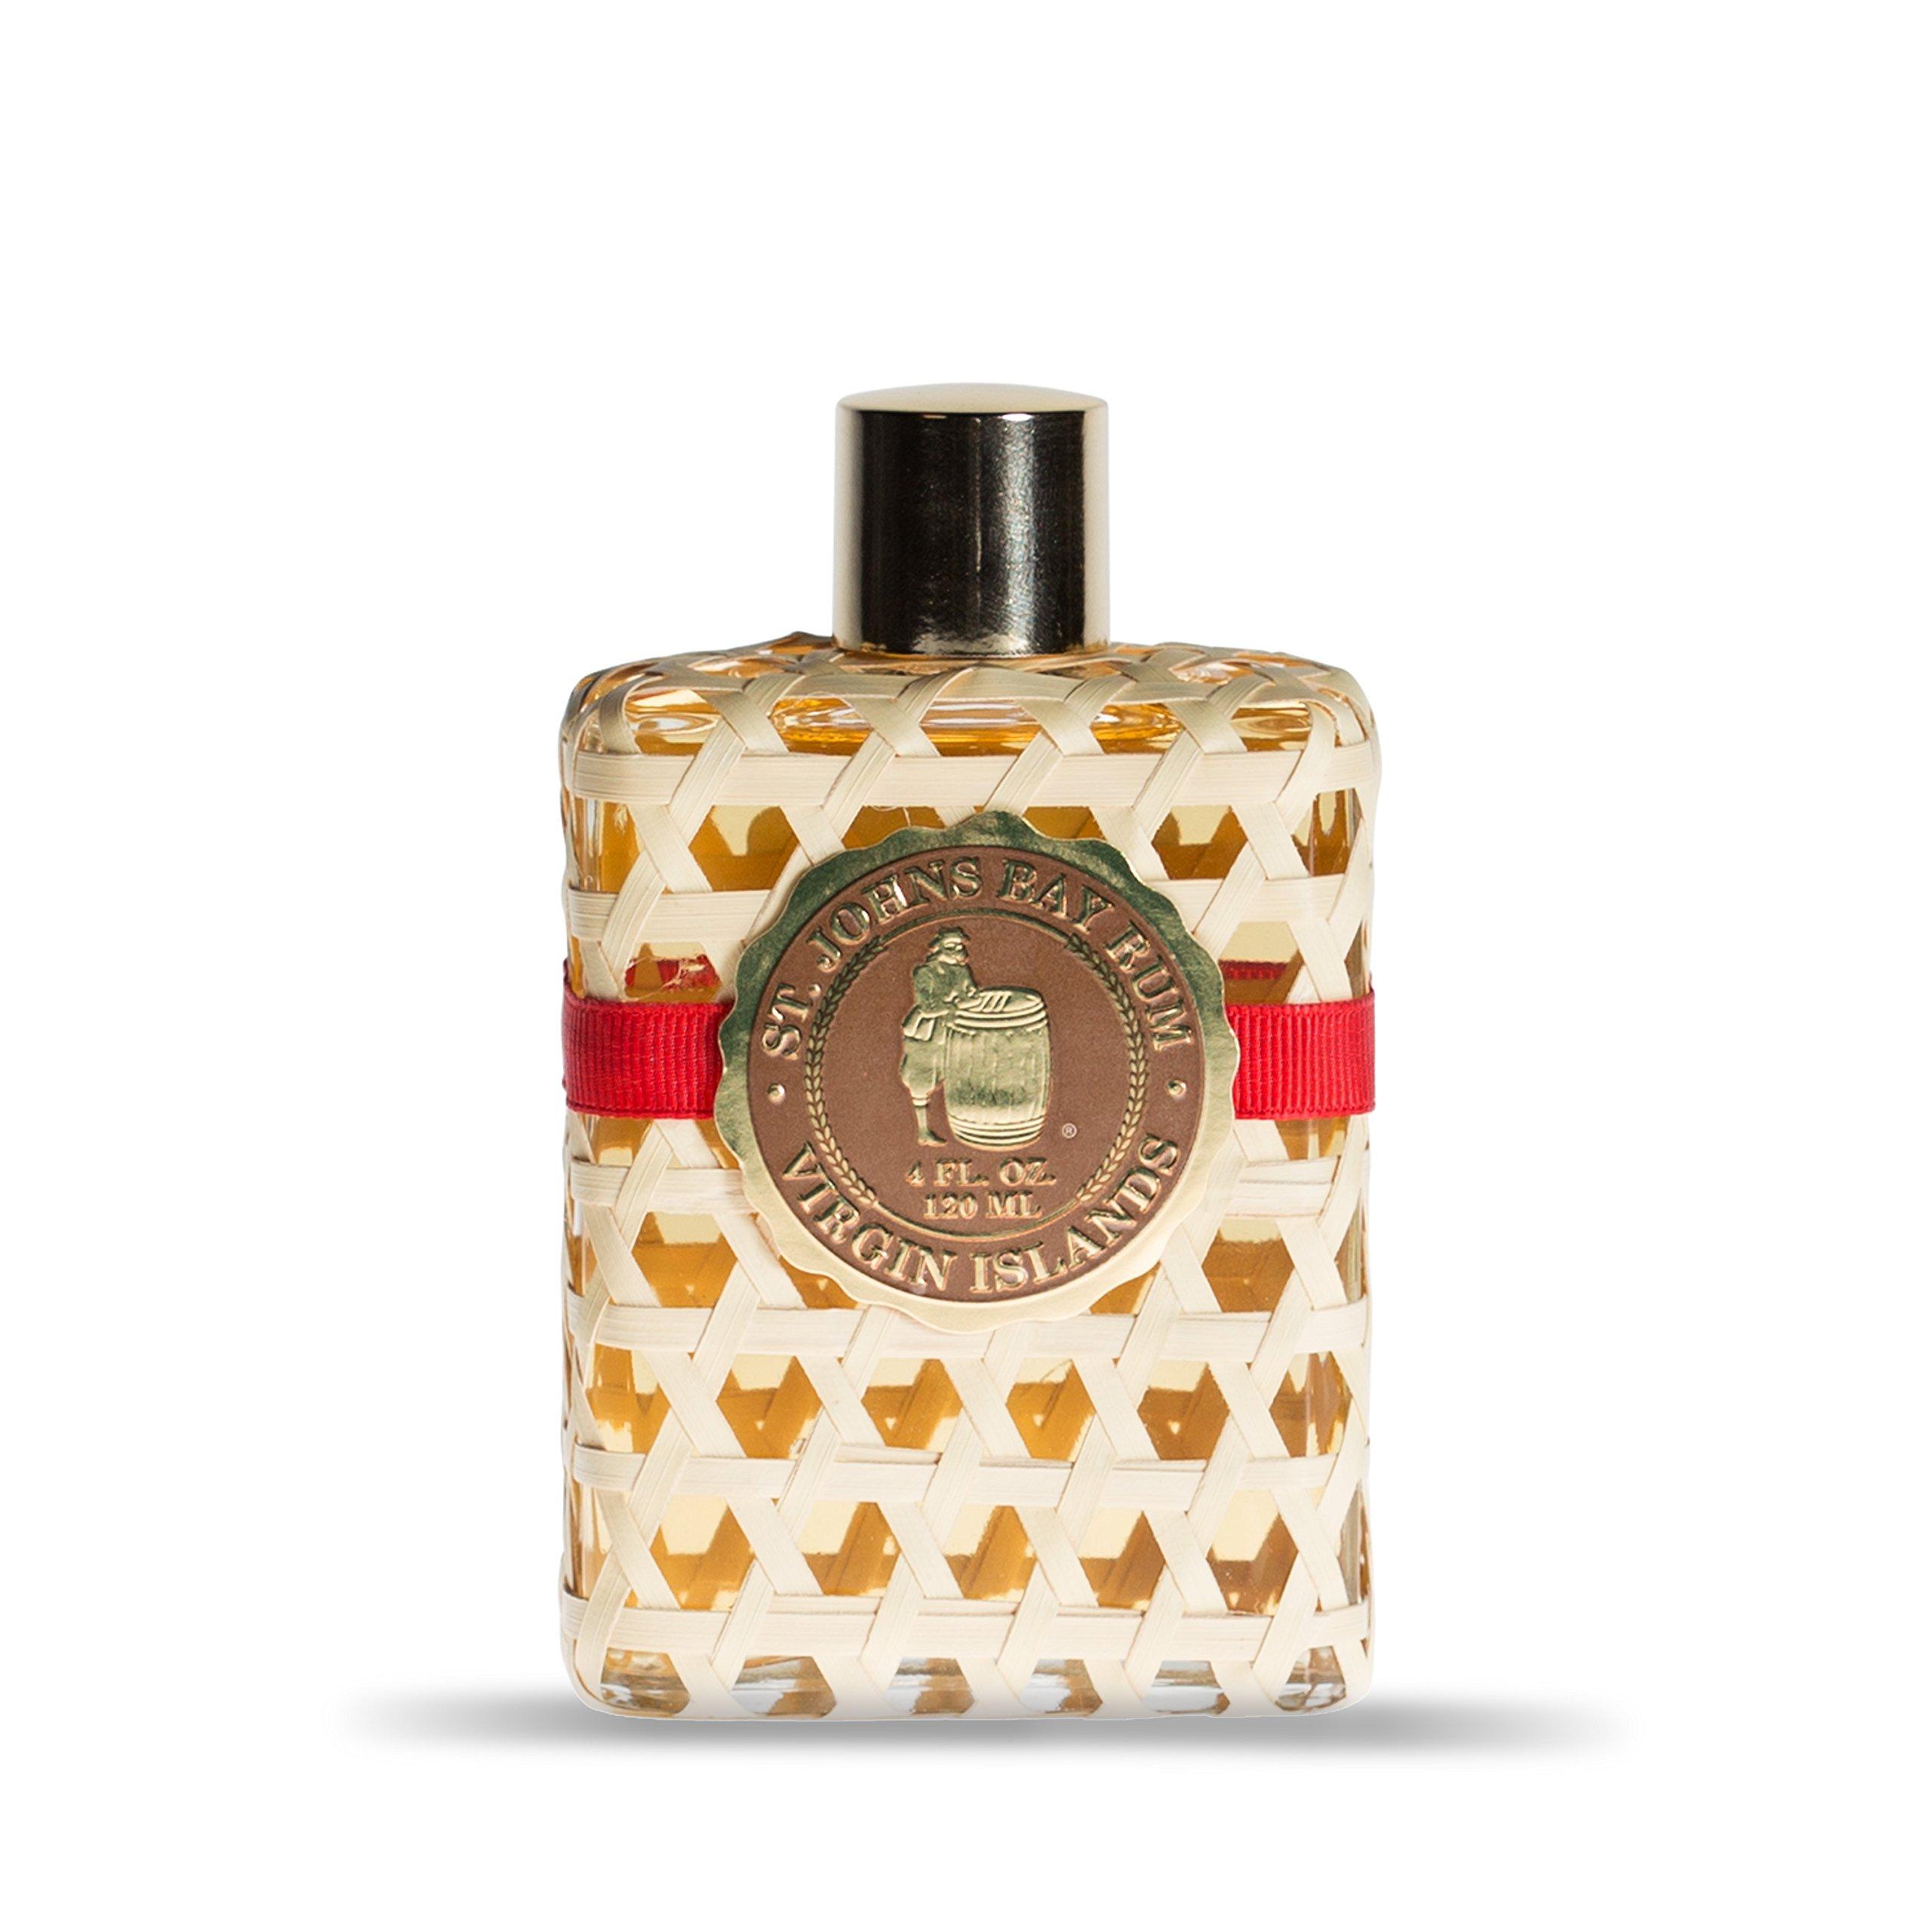 St Johns Bay Rum Aftershave Lotion/Cologne 4 Oz Splash. The Popular, Best Smelling Bay Rum for Guys. Premium Bay Leaf Oils. Signature Hand Woven Bottle. Handcrafted. St. Thomas, U.S. Virgin Islands